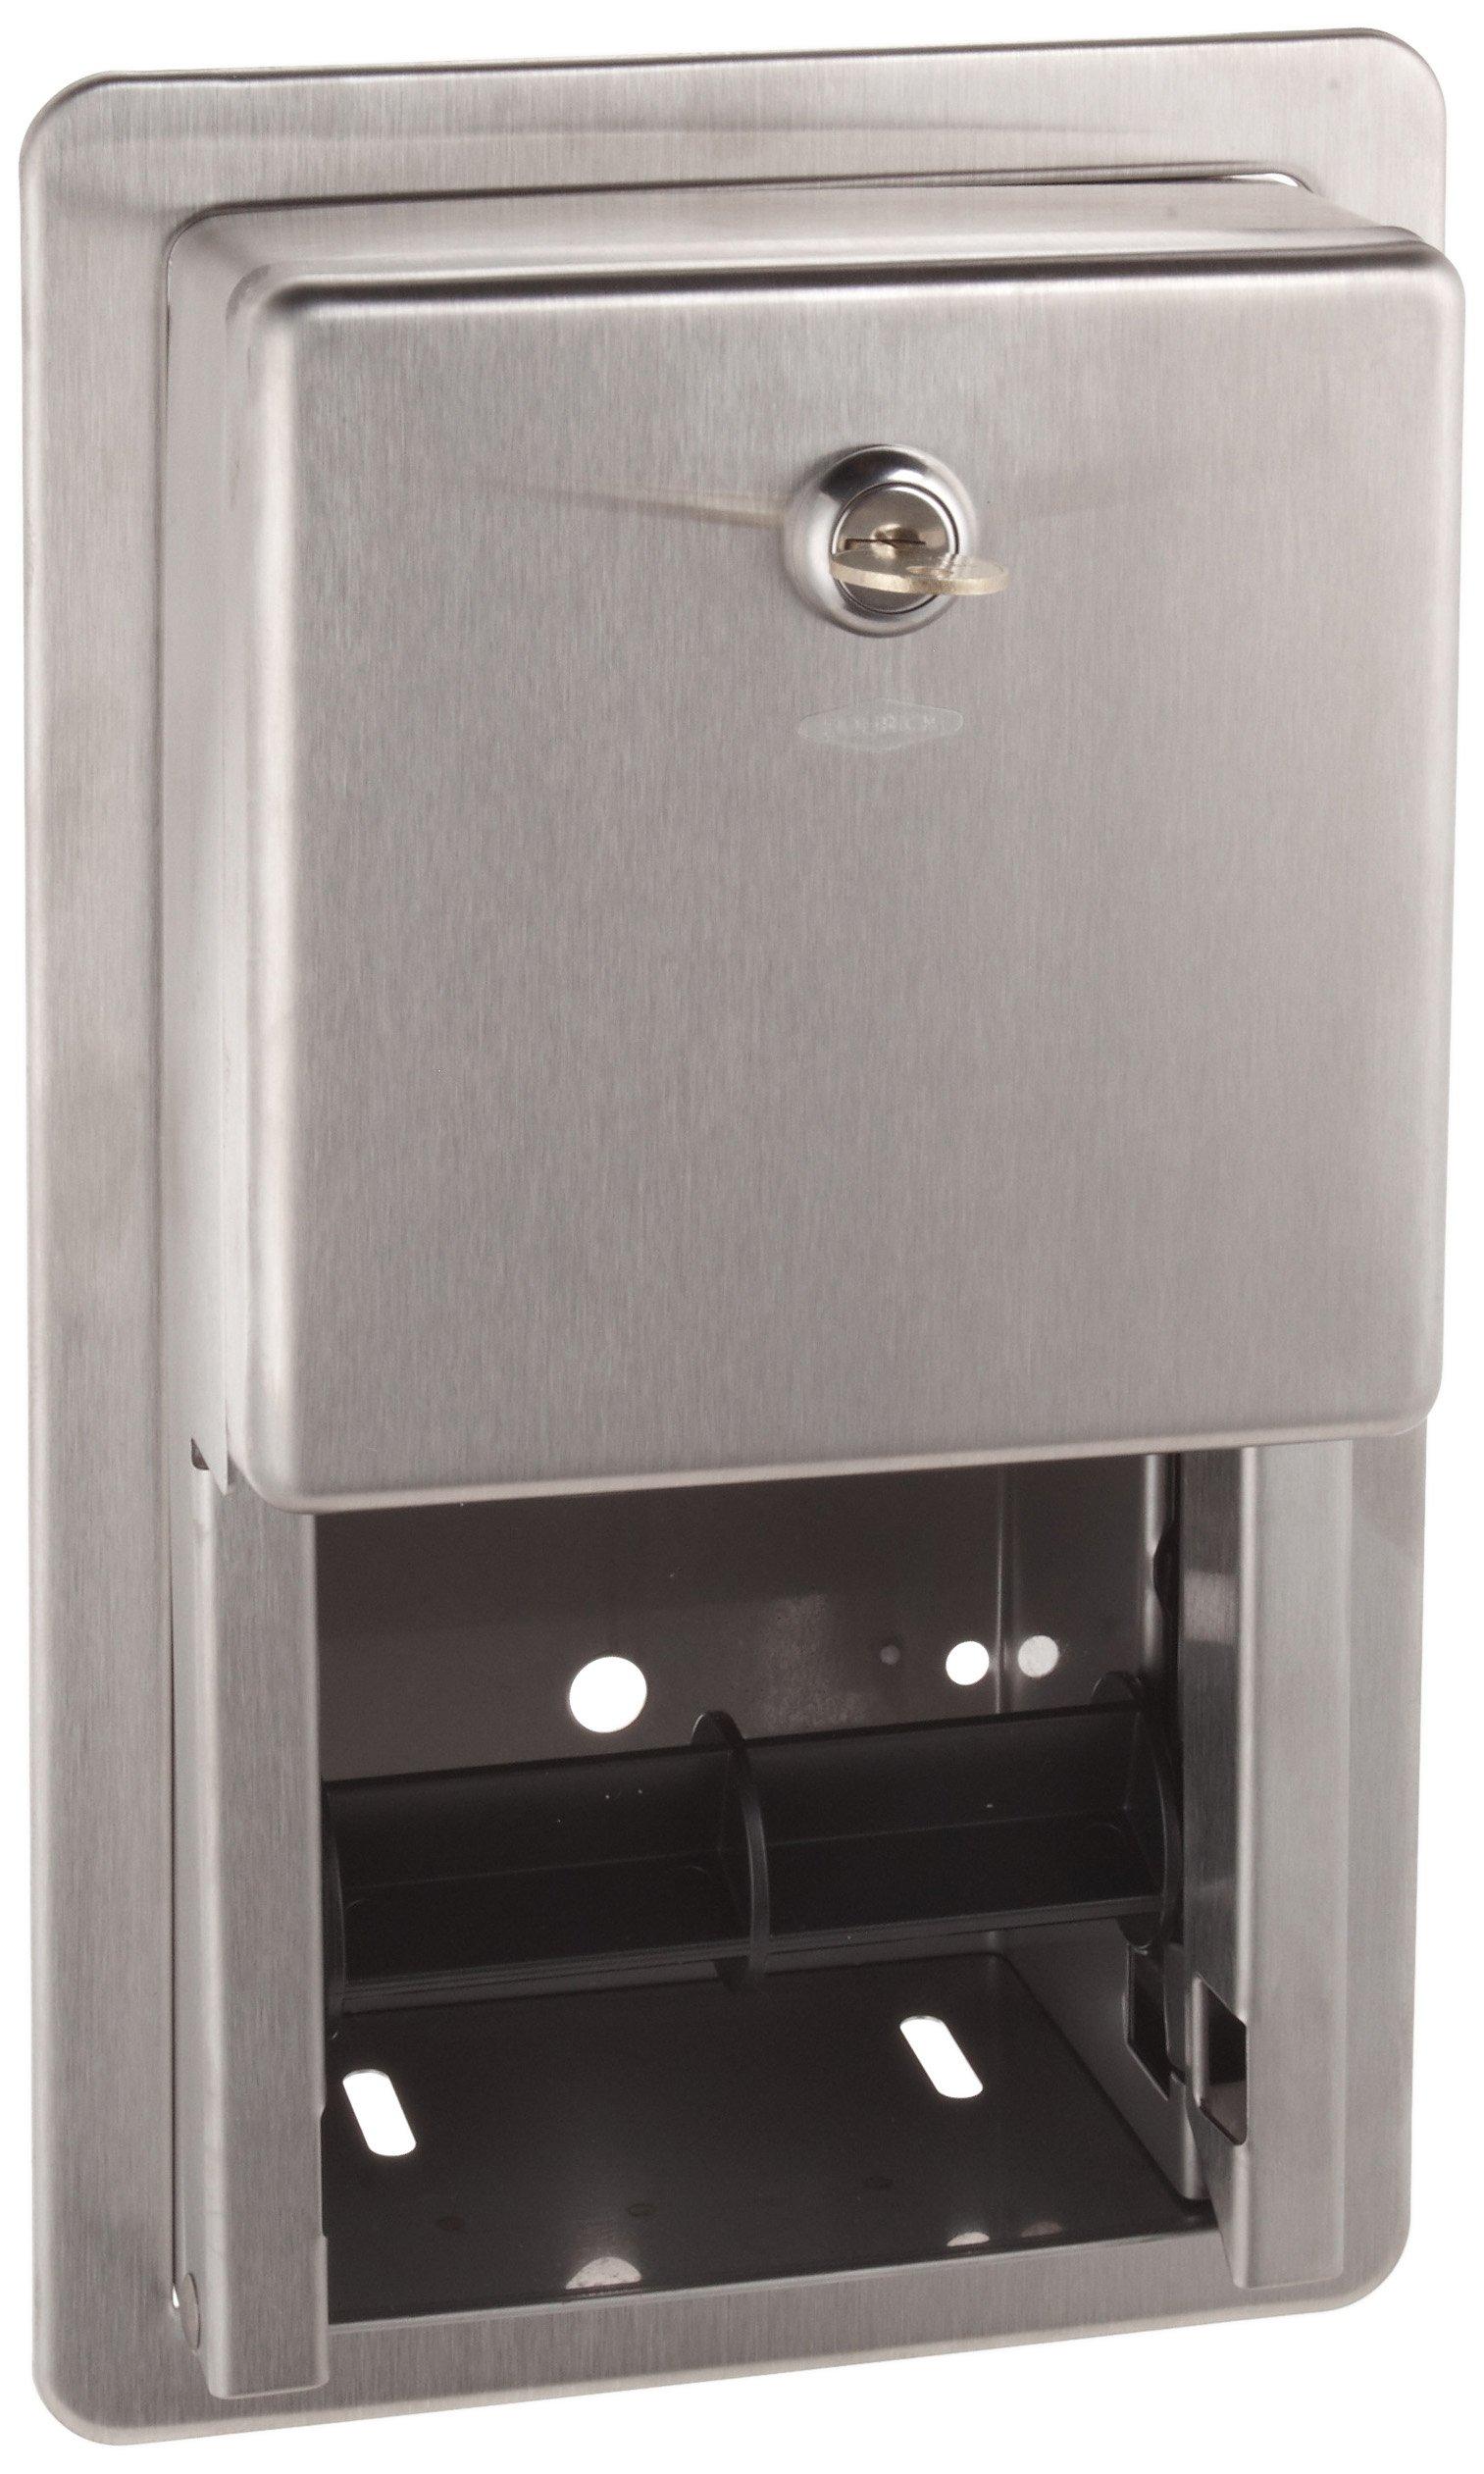 Bobrick B-3888 5-1/4'' Diameter, Stainless Steel Classic Series Recessed Multi Roll Toilet Tissue Dispenser